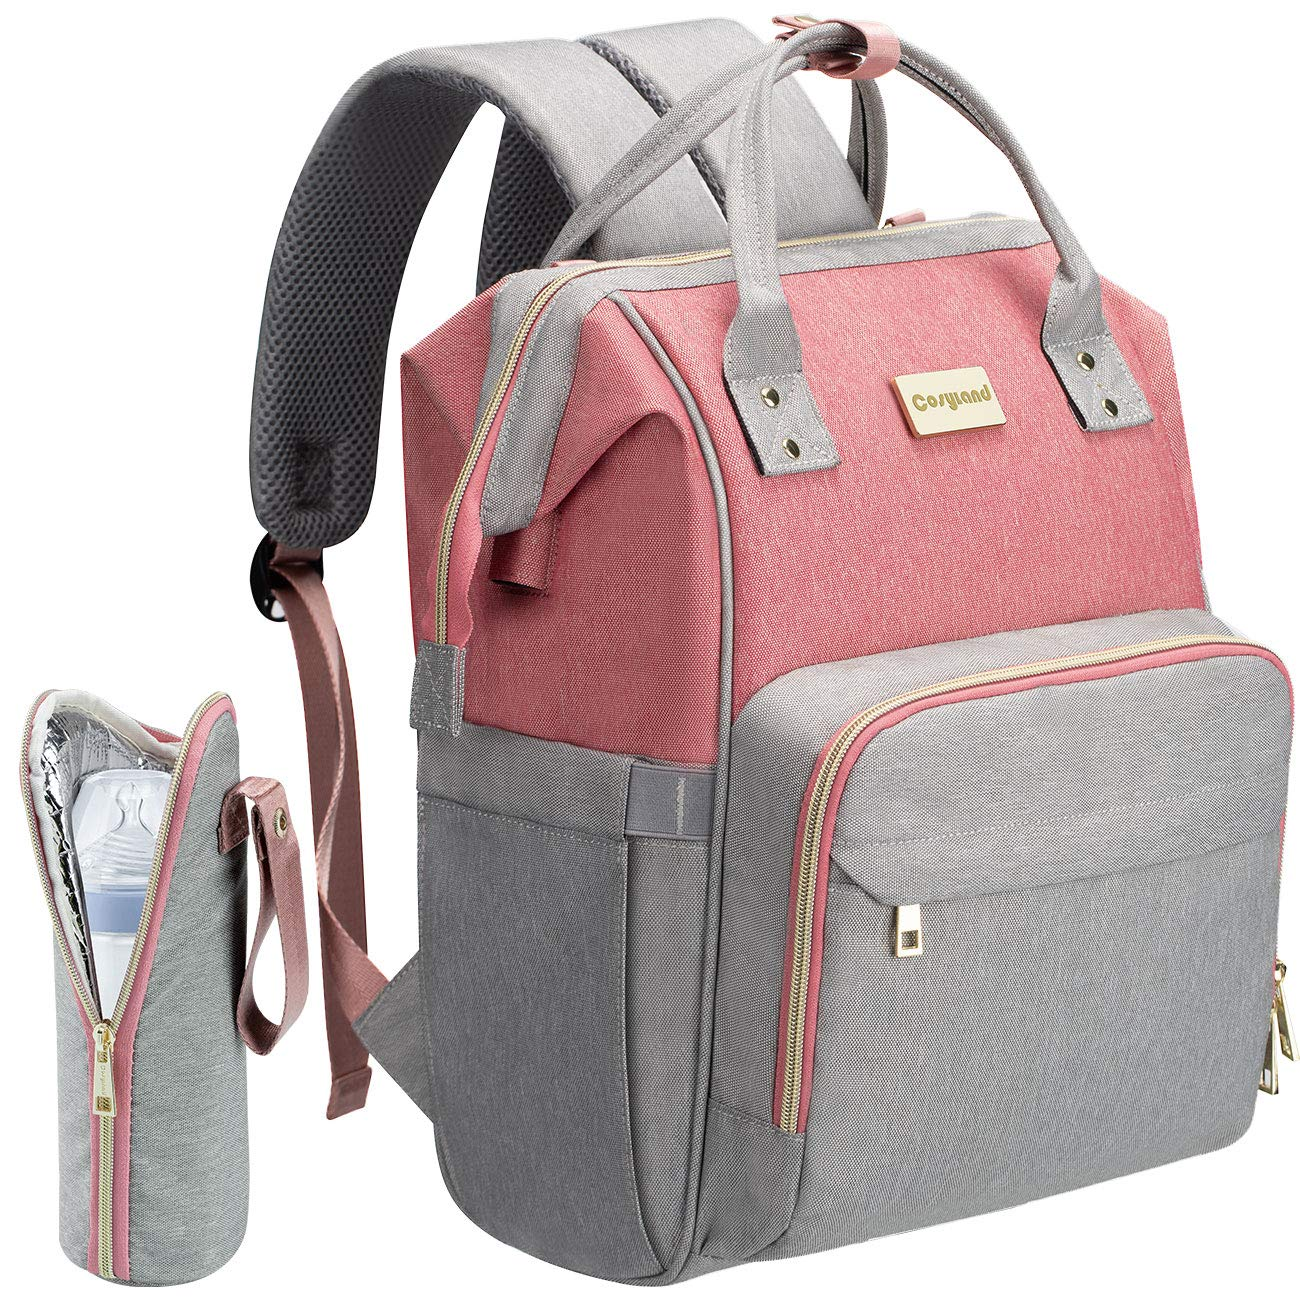 COSYLAND Mom Travel Diaper Bag Backpack